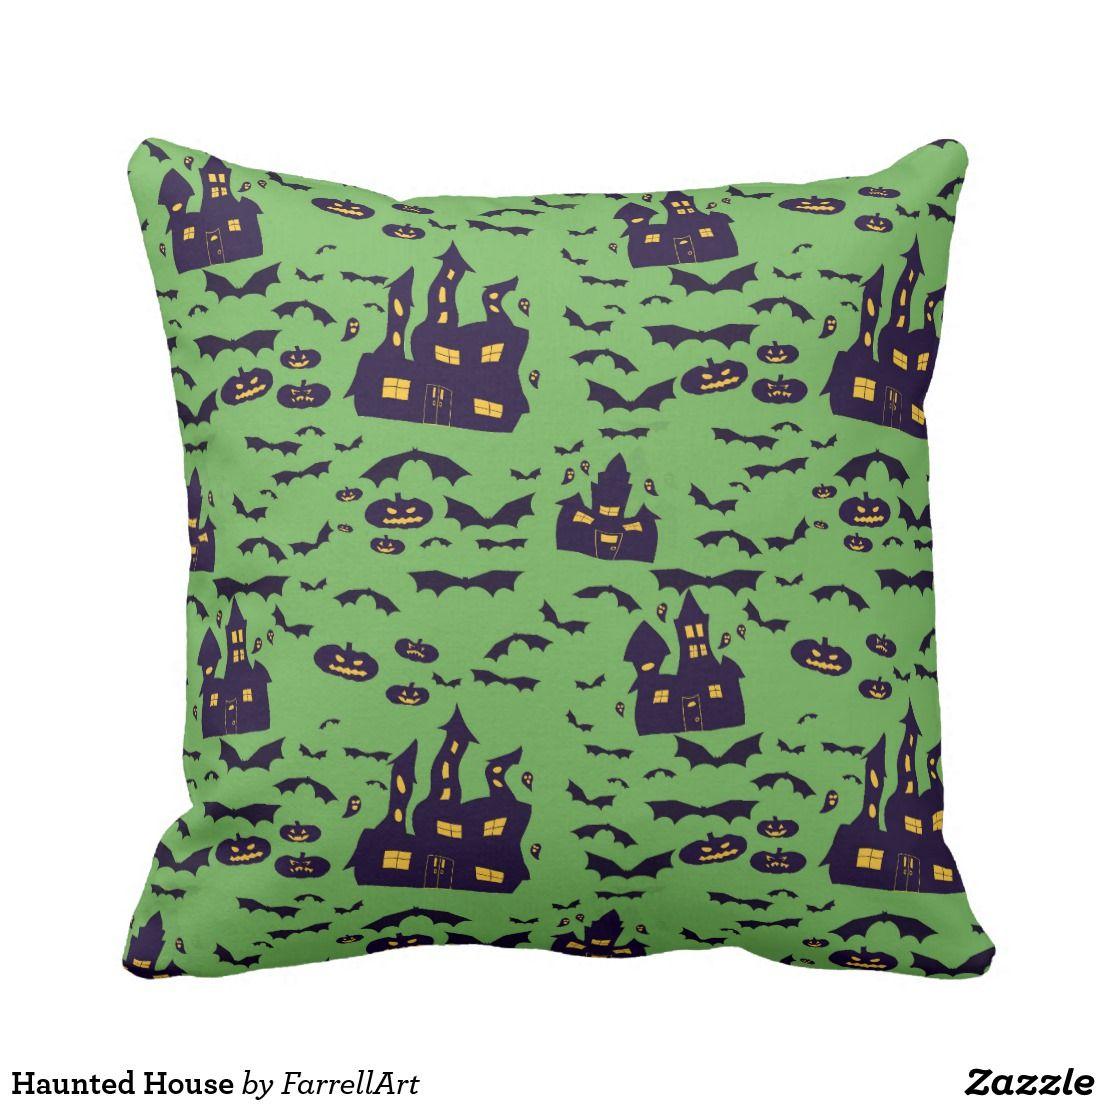 Haunted House Throw Pillow Throw pillows